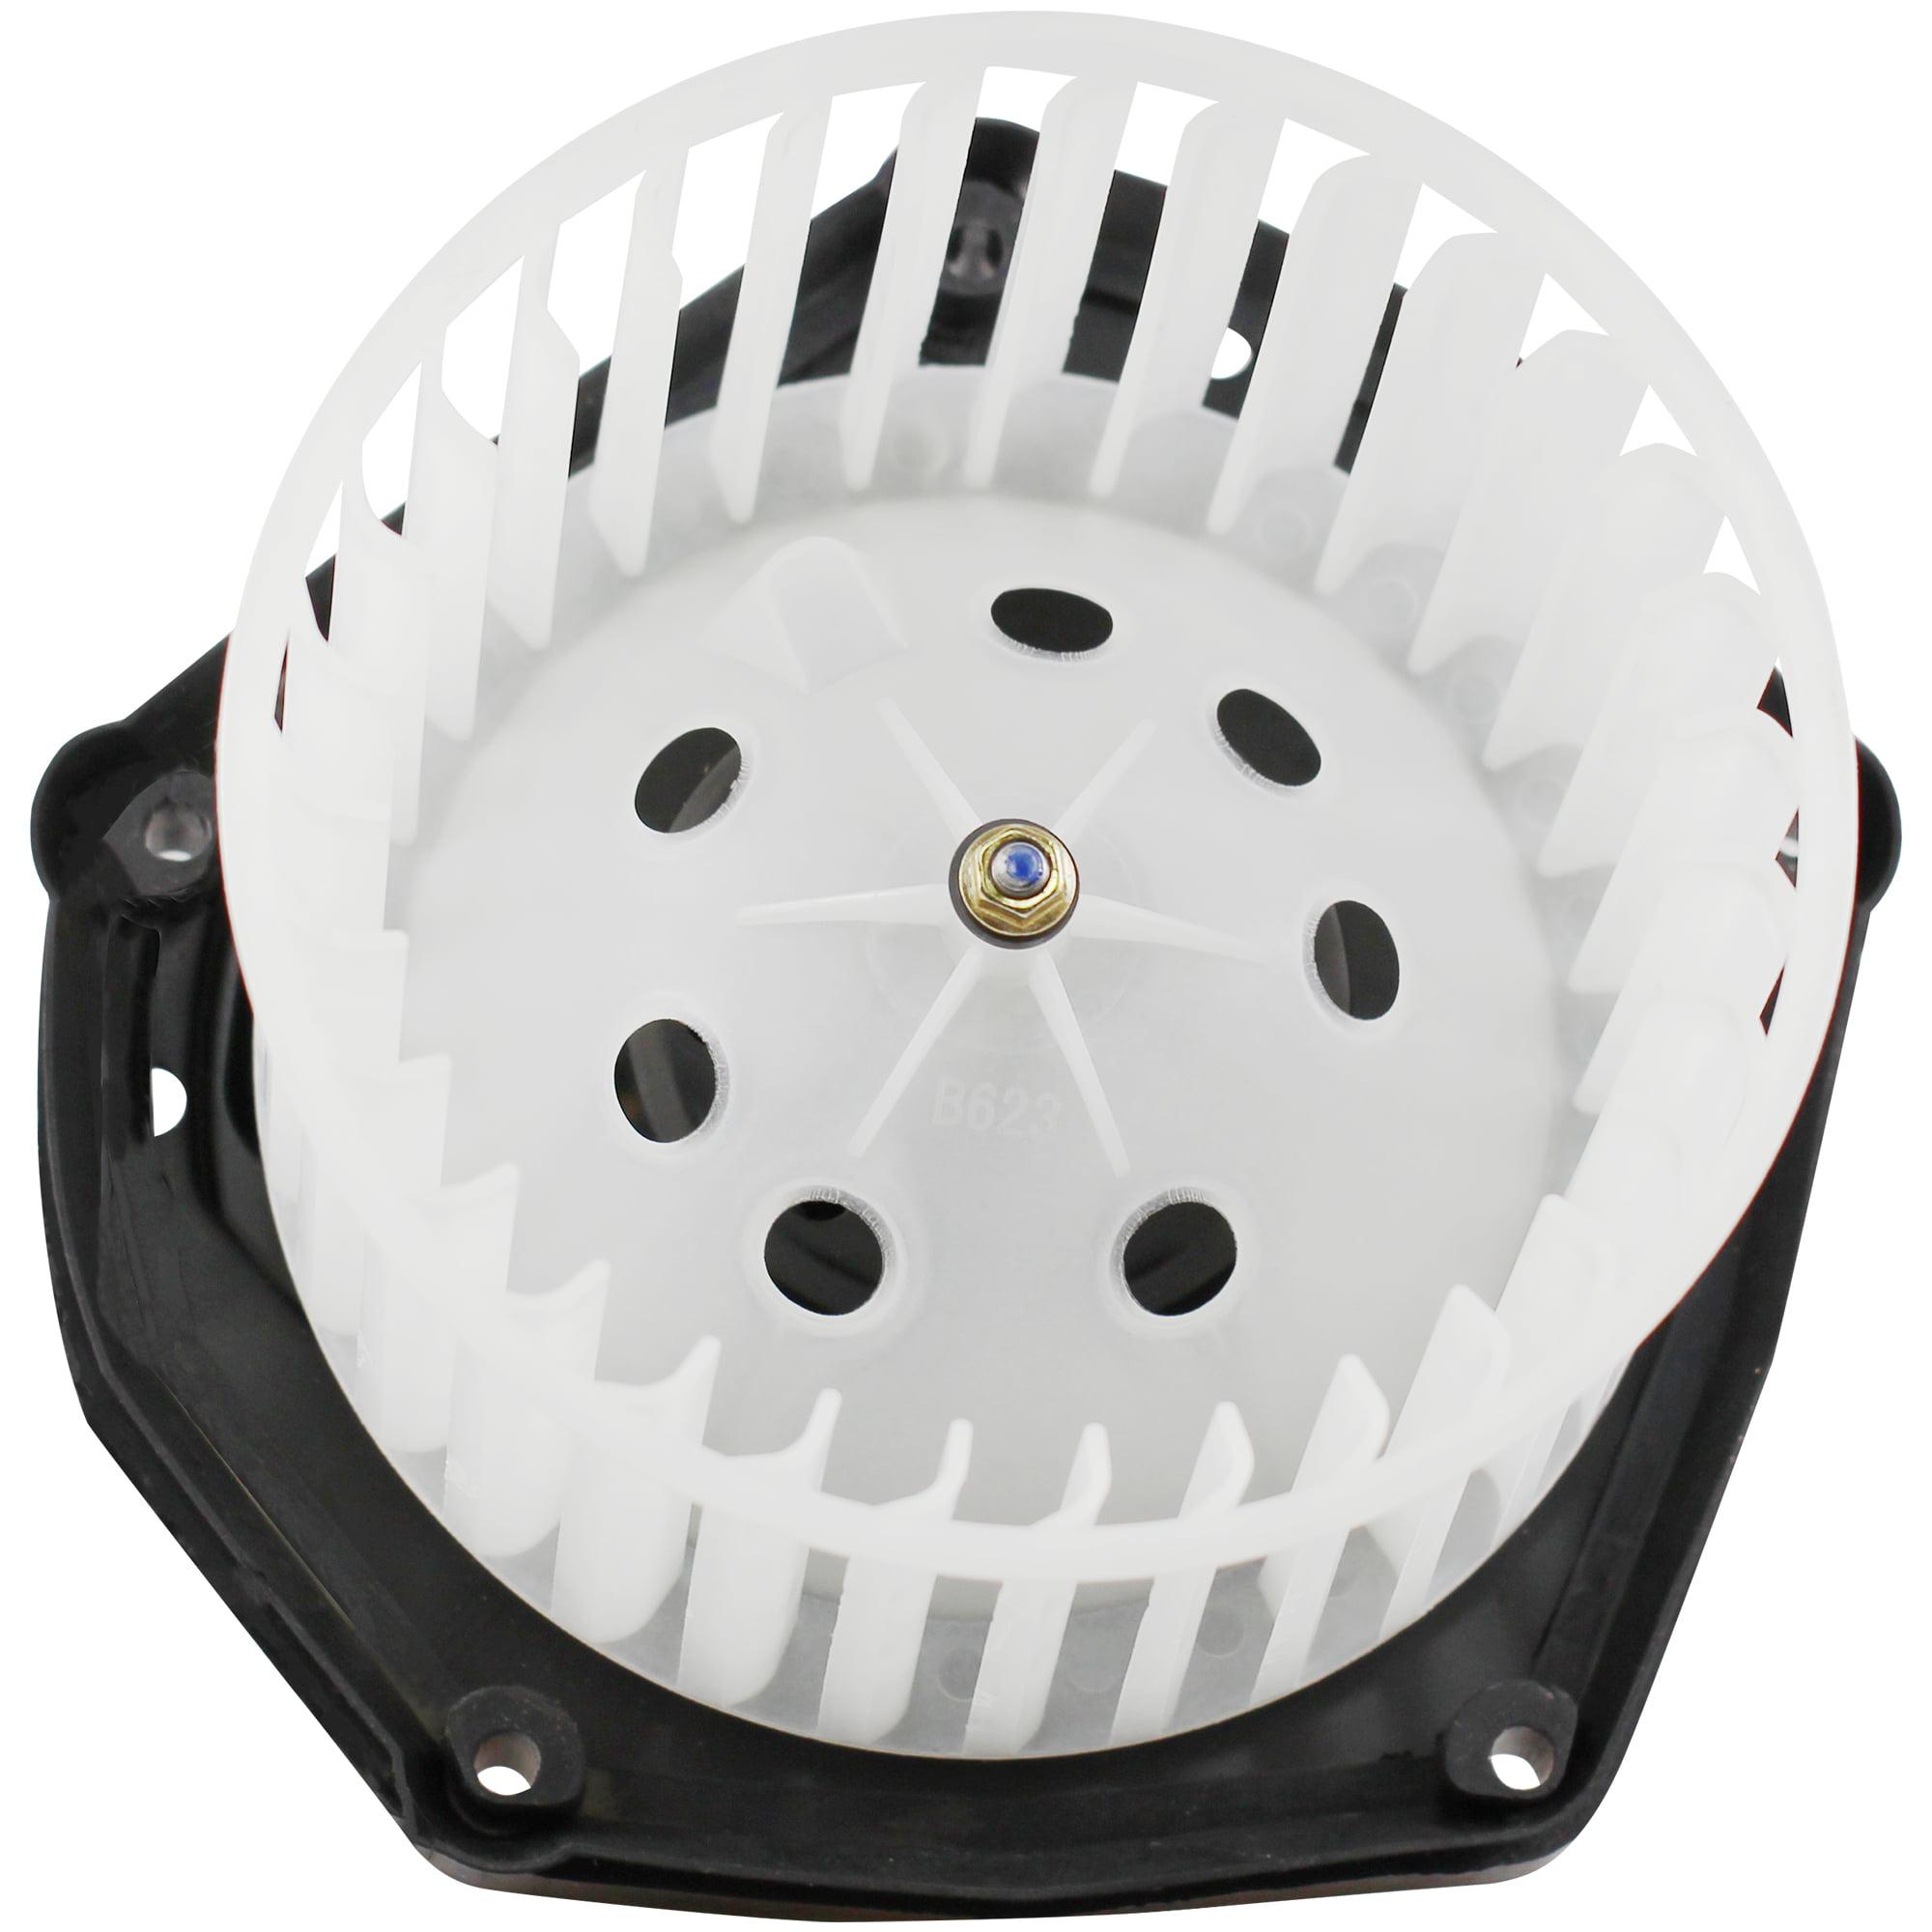 Heater Blower Motor w// Fan Cage for Chevy GMC C//K Pickup Truck Suburban Yukon